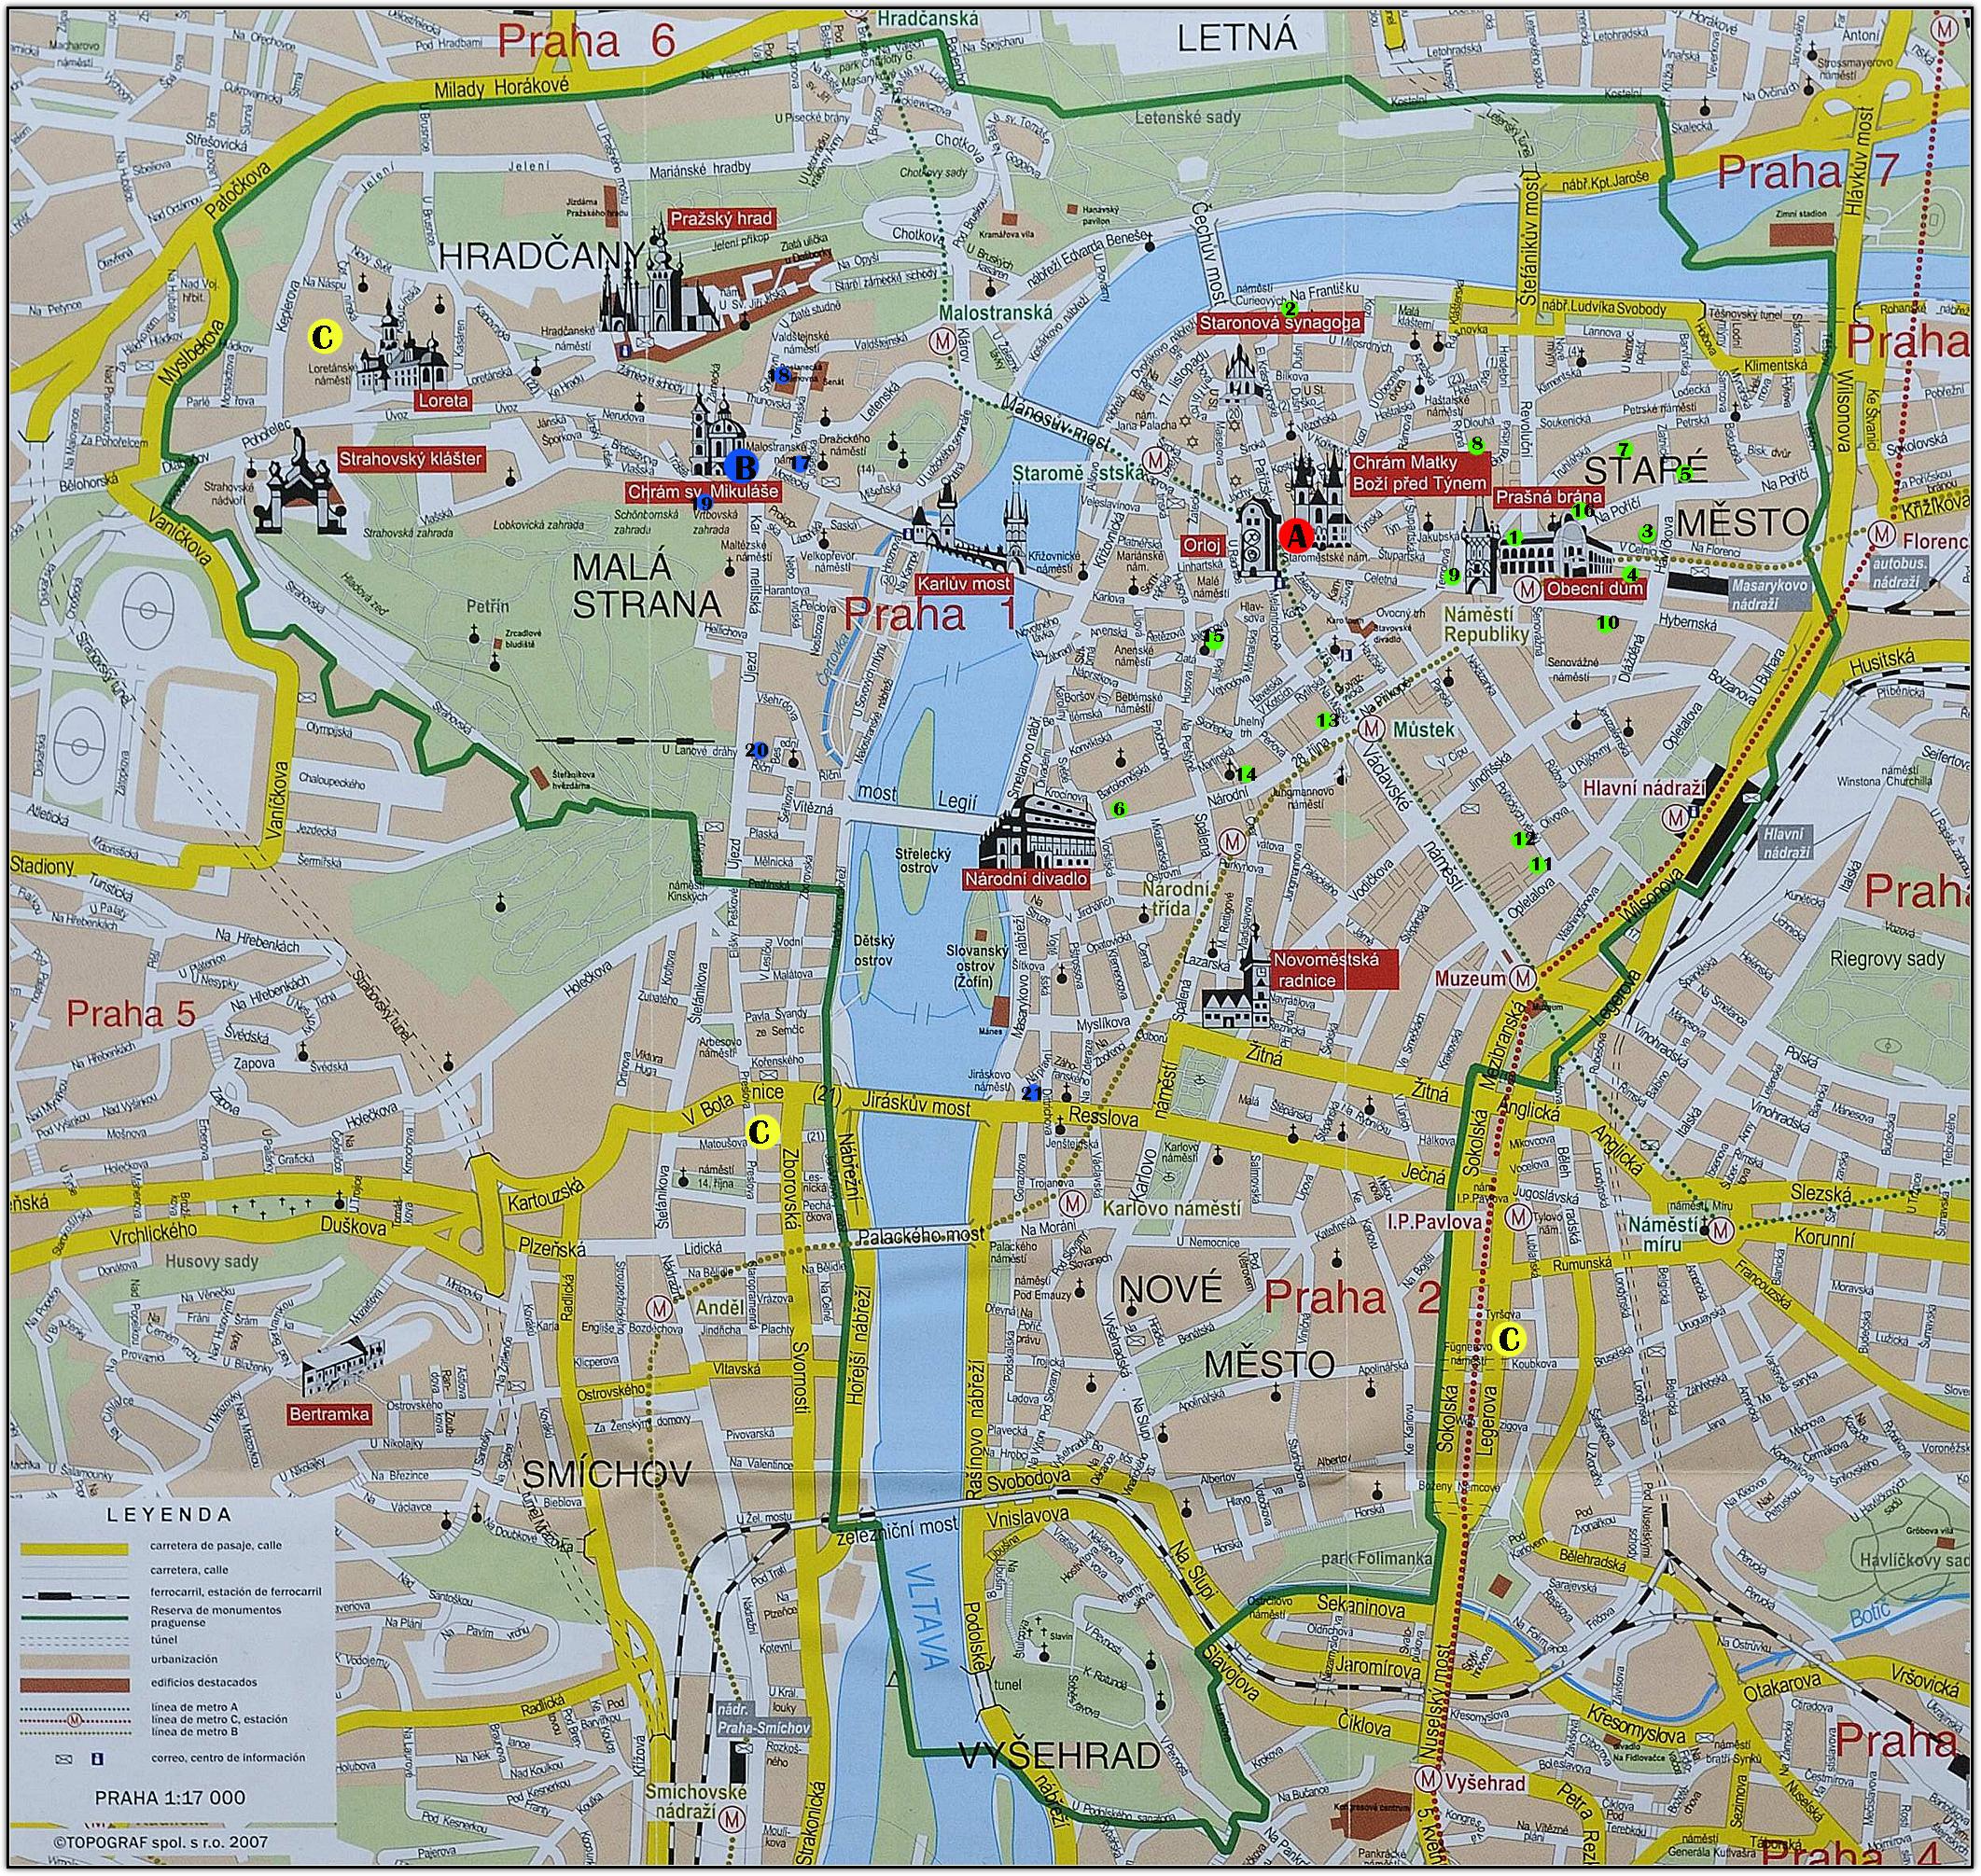 Hoteles en praga mapa for Hoteles en praga